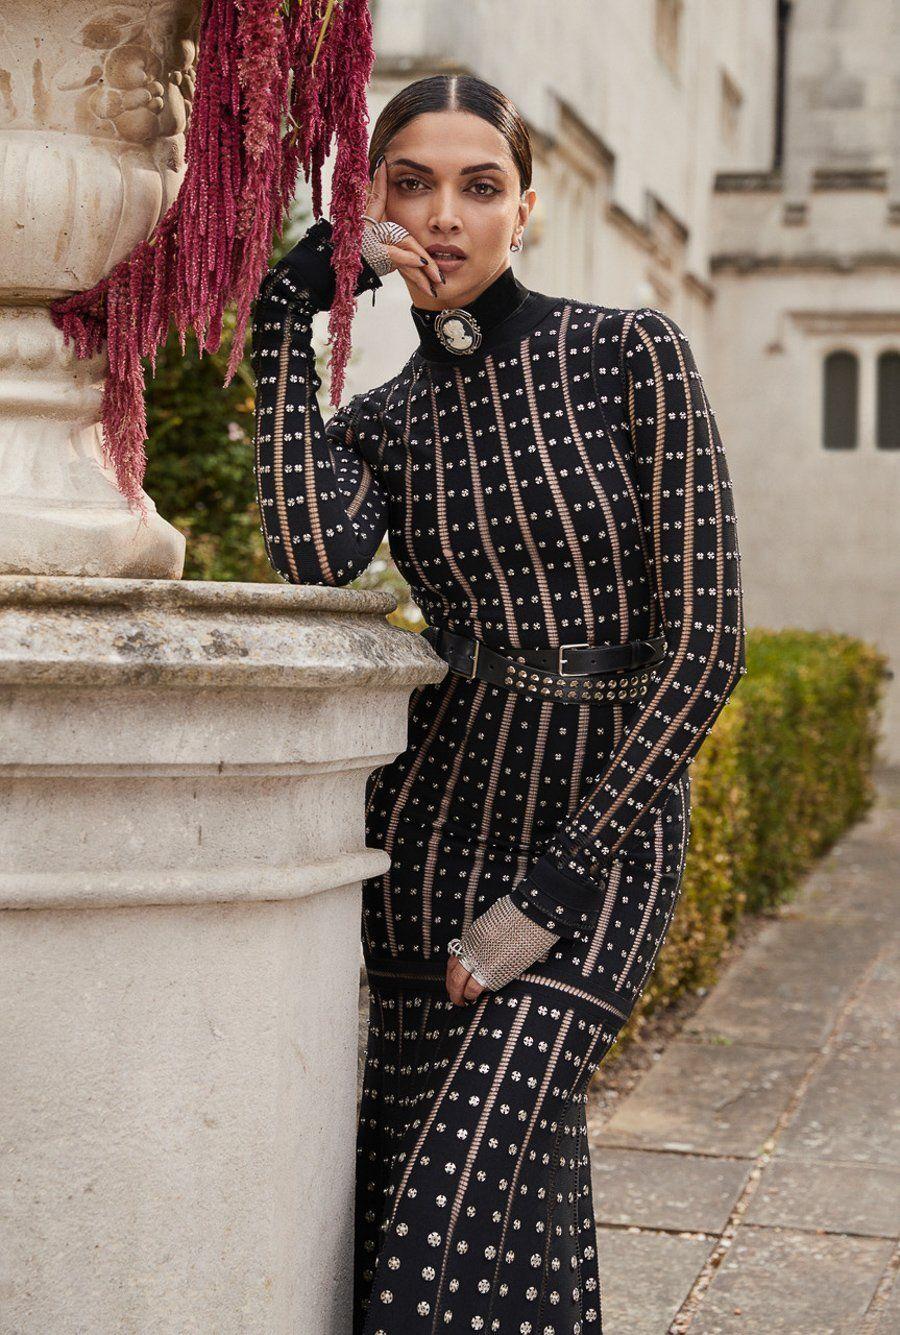 FashionweekNYC on in 2020 | Deepika padukone style ...